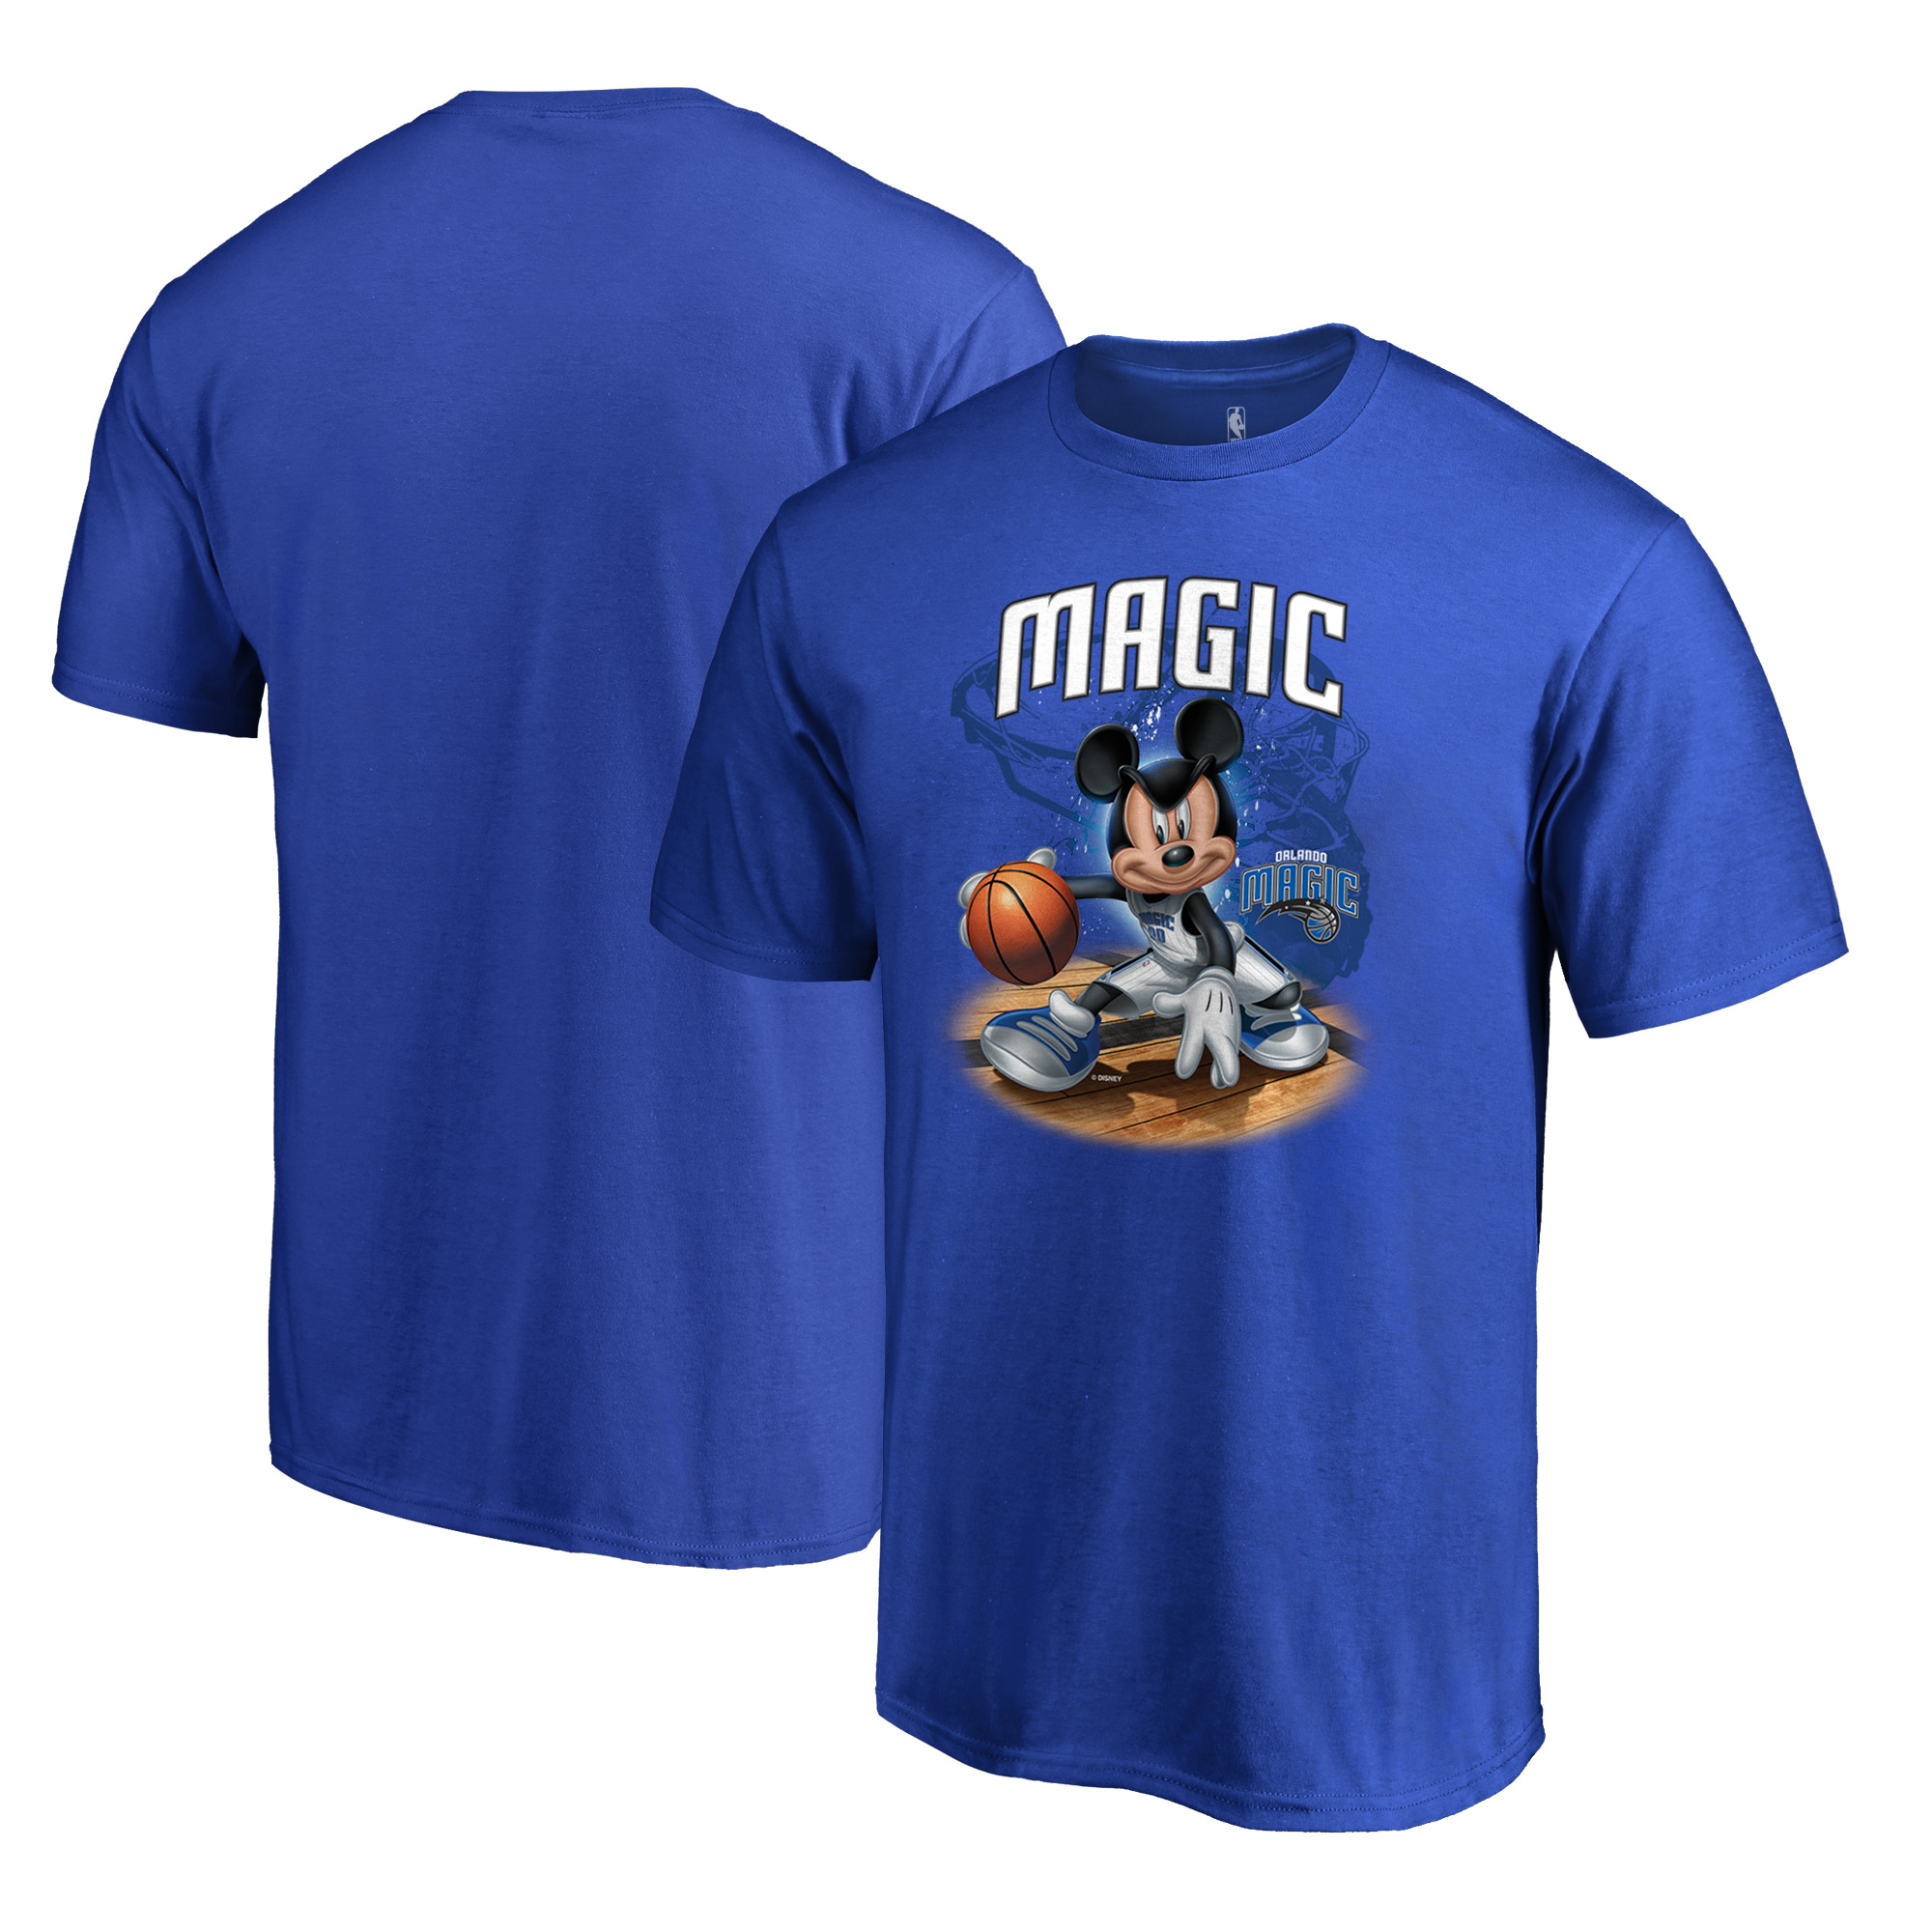 Orlando Magic Fanatics Branded Disney NBA All-Star T-Shirt - Blue